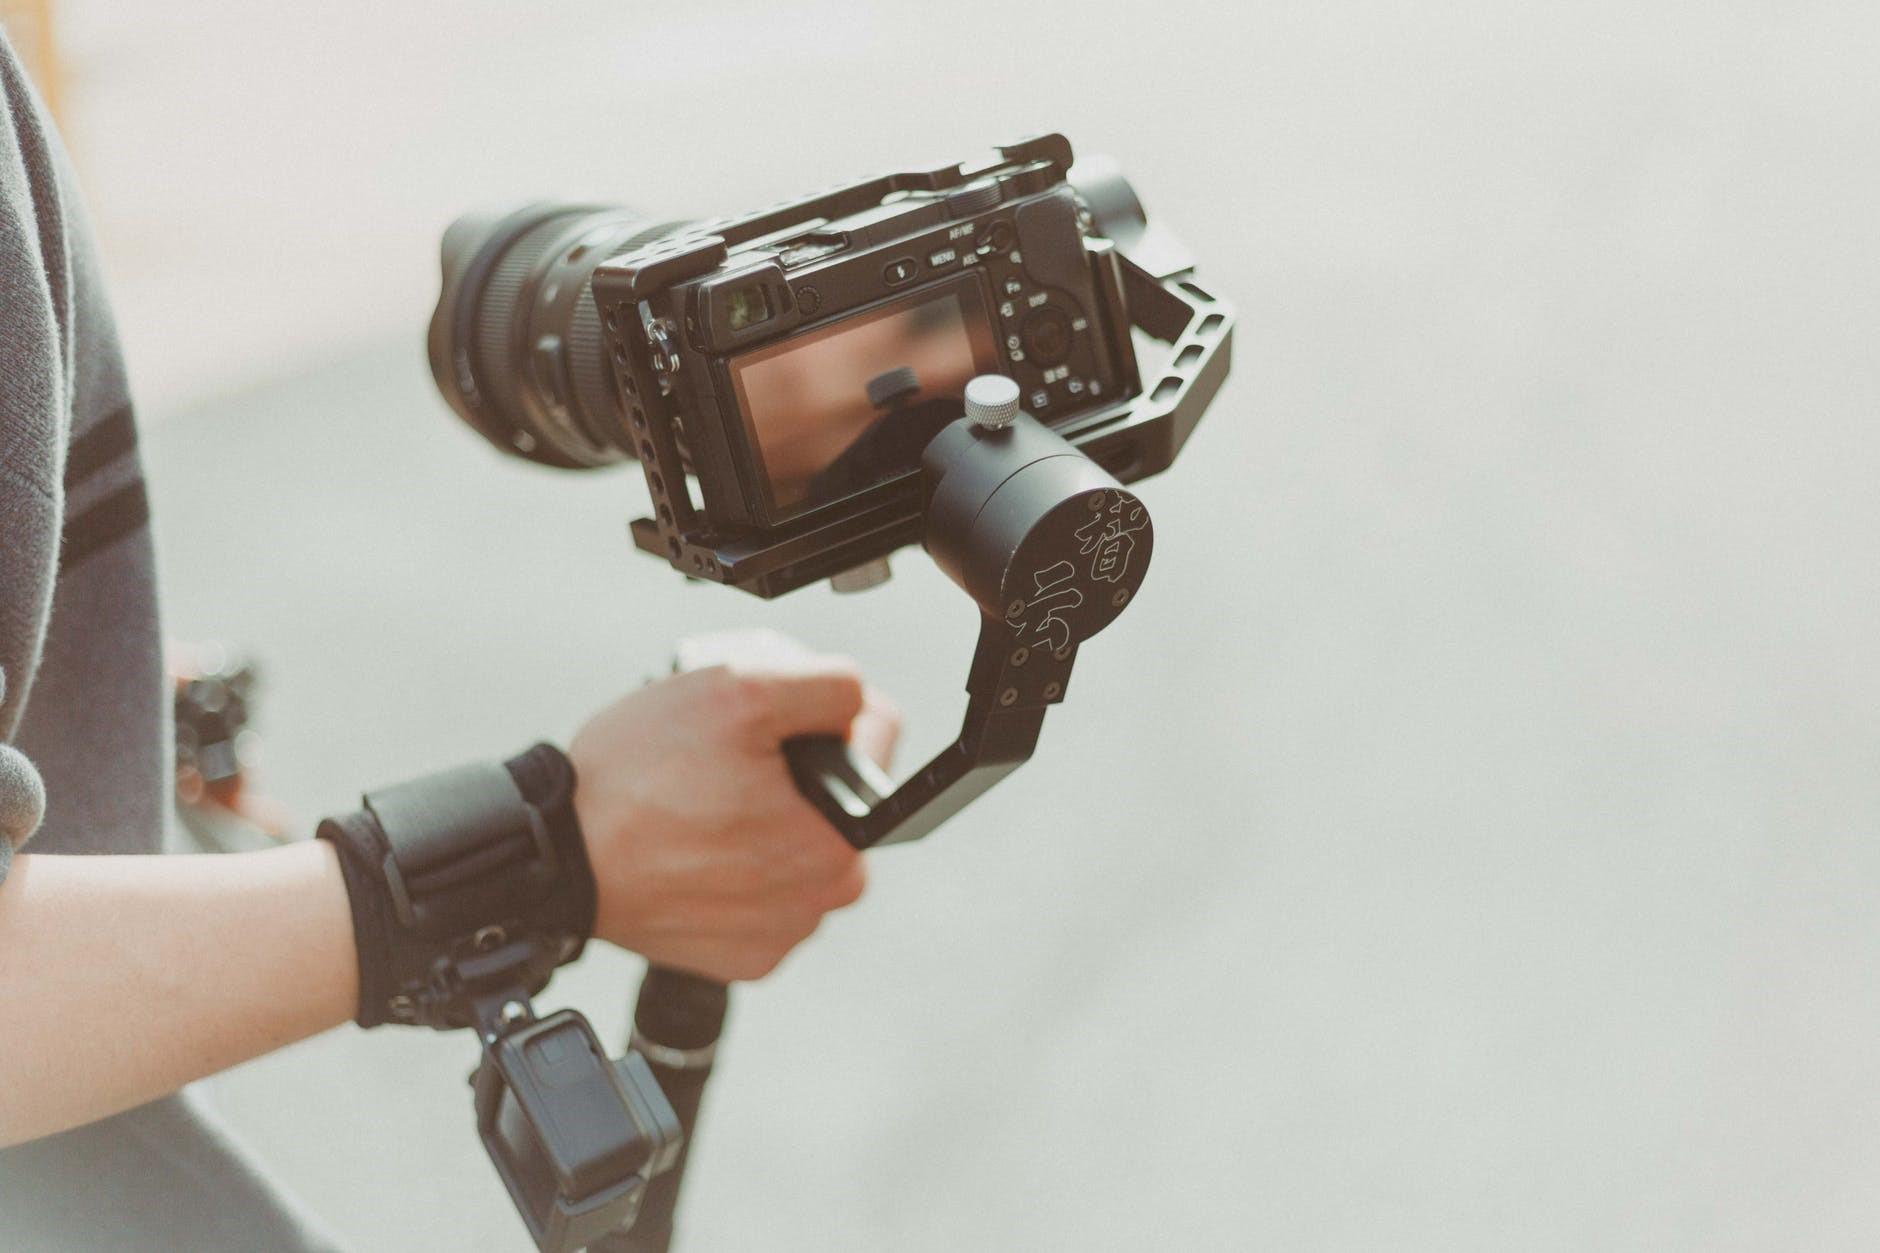 compress 4k videos